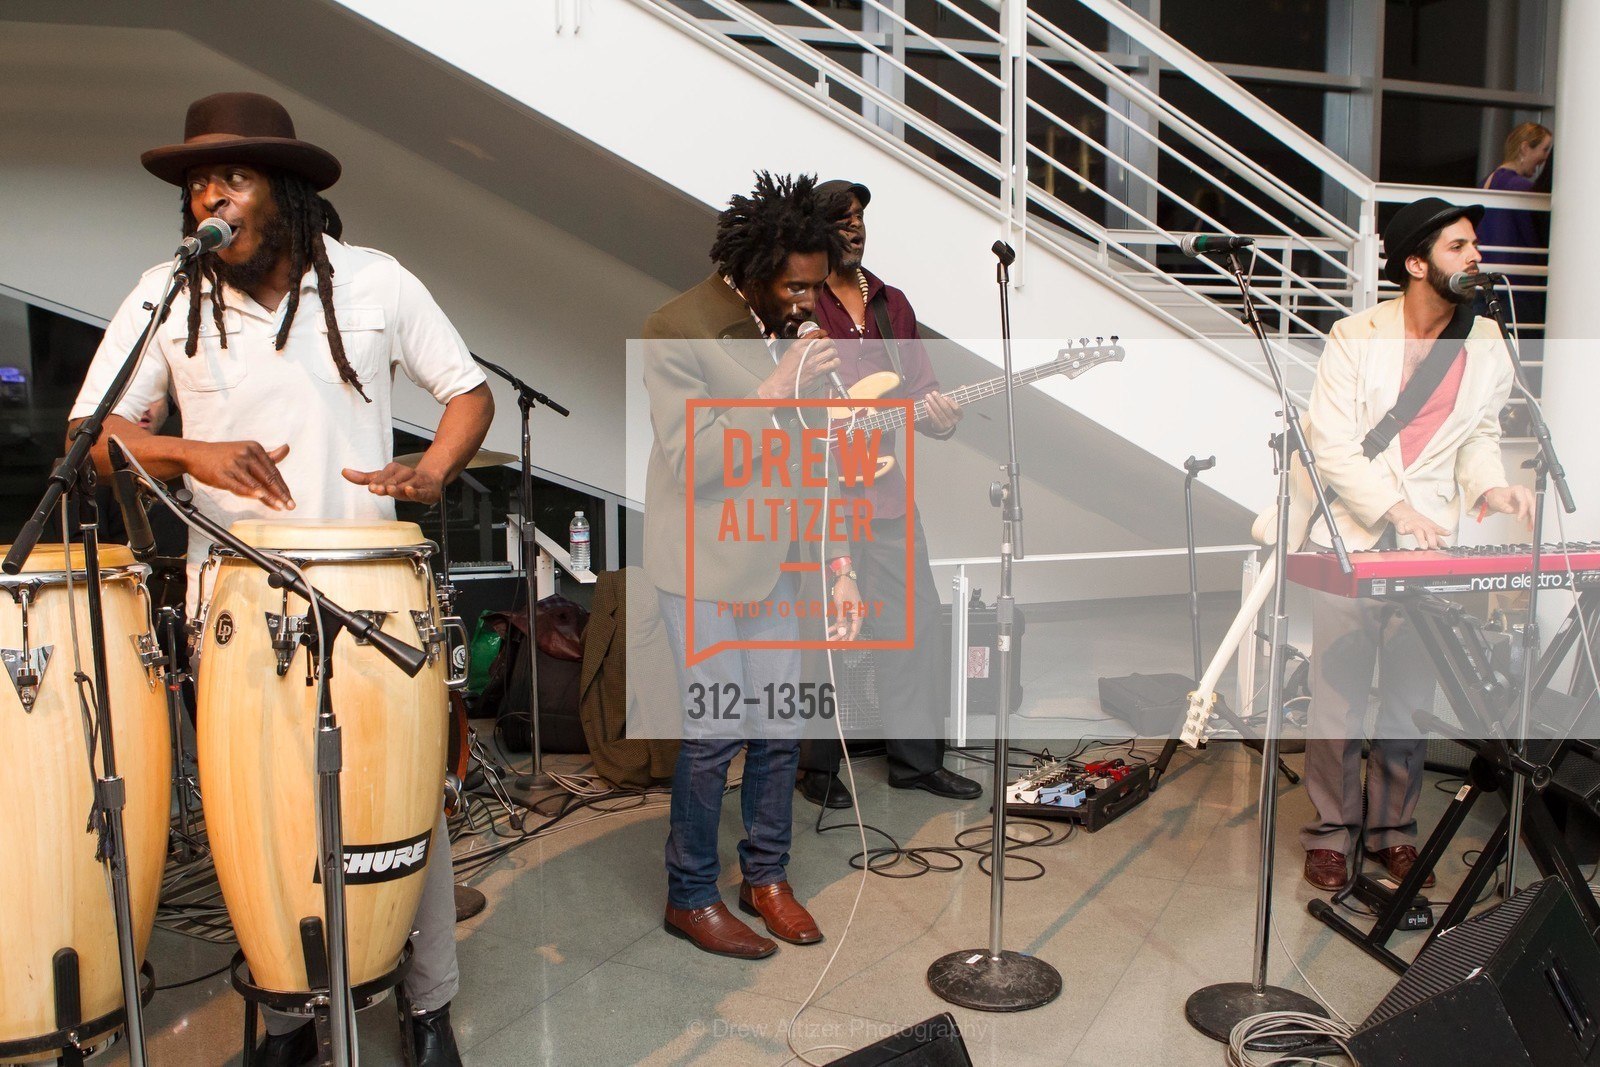 Performance, Photo #312-1356